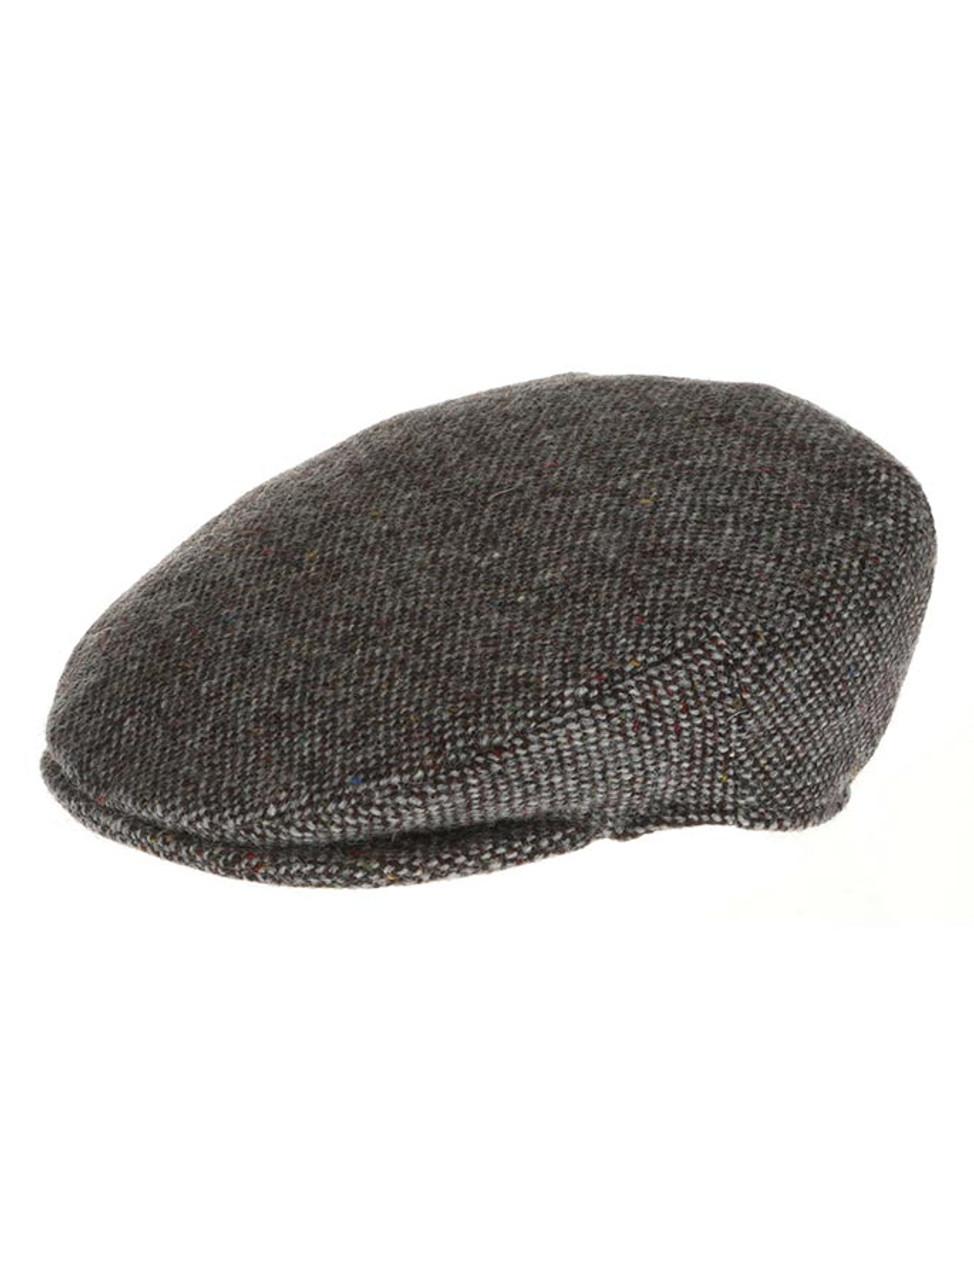 Vintage Tweed Flat Cap - Grey Salt   Pepper  36f1464c5ff